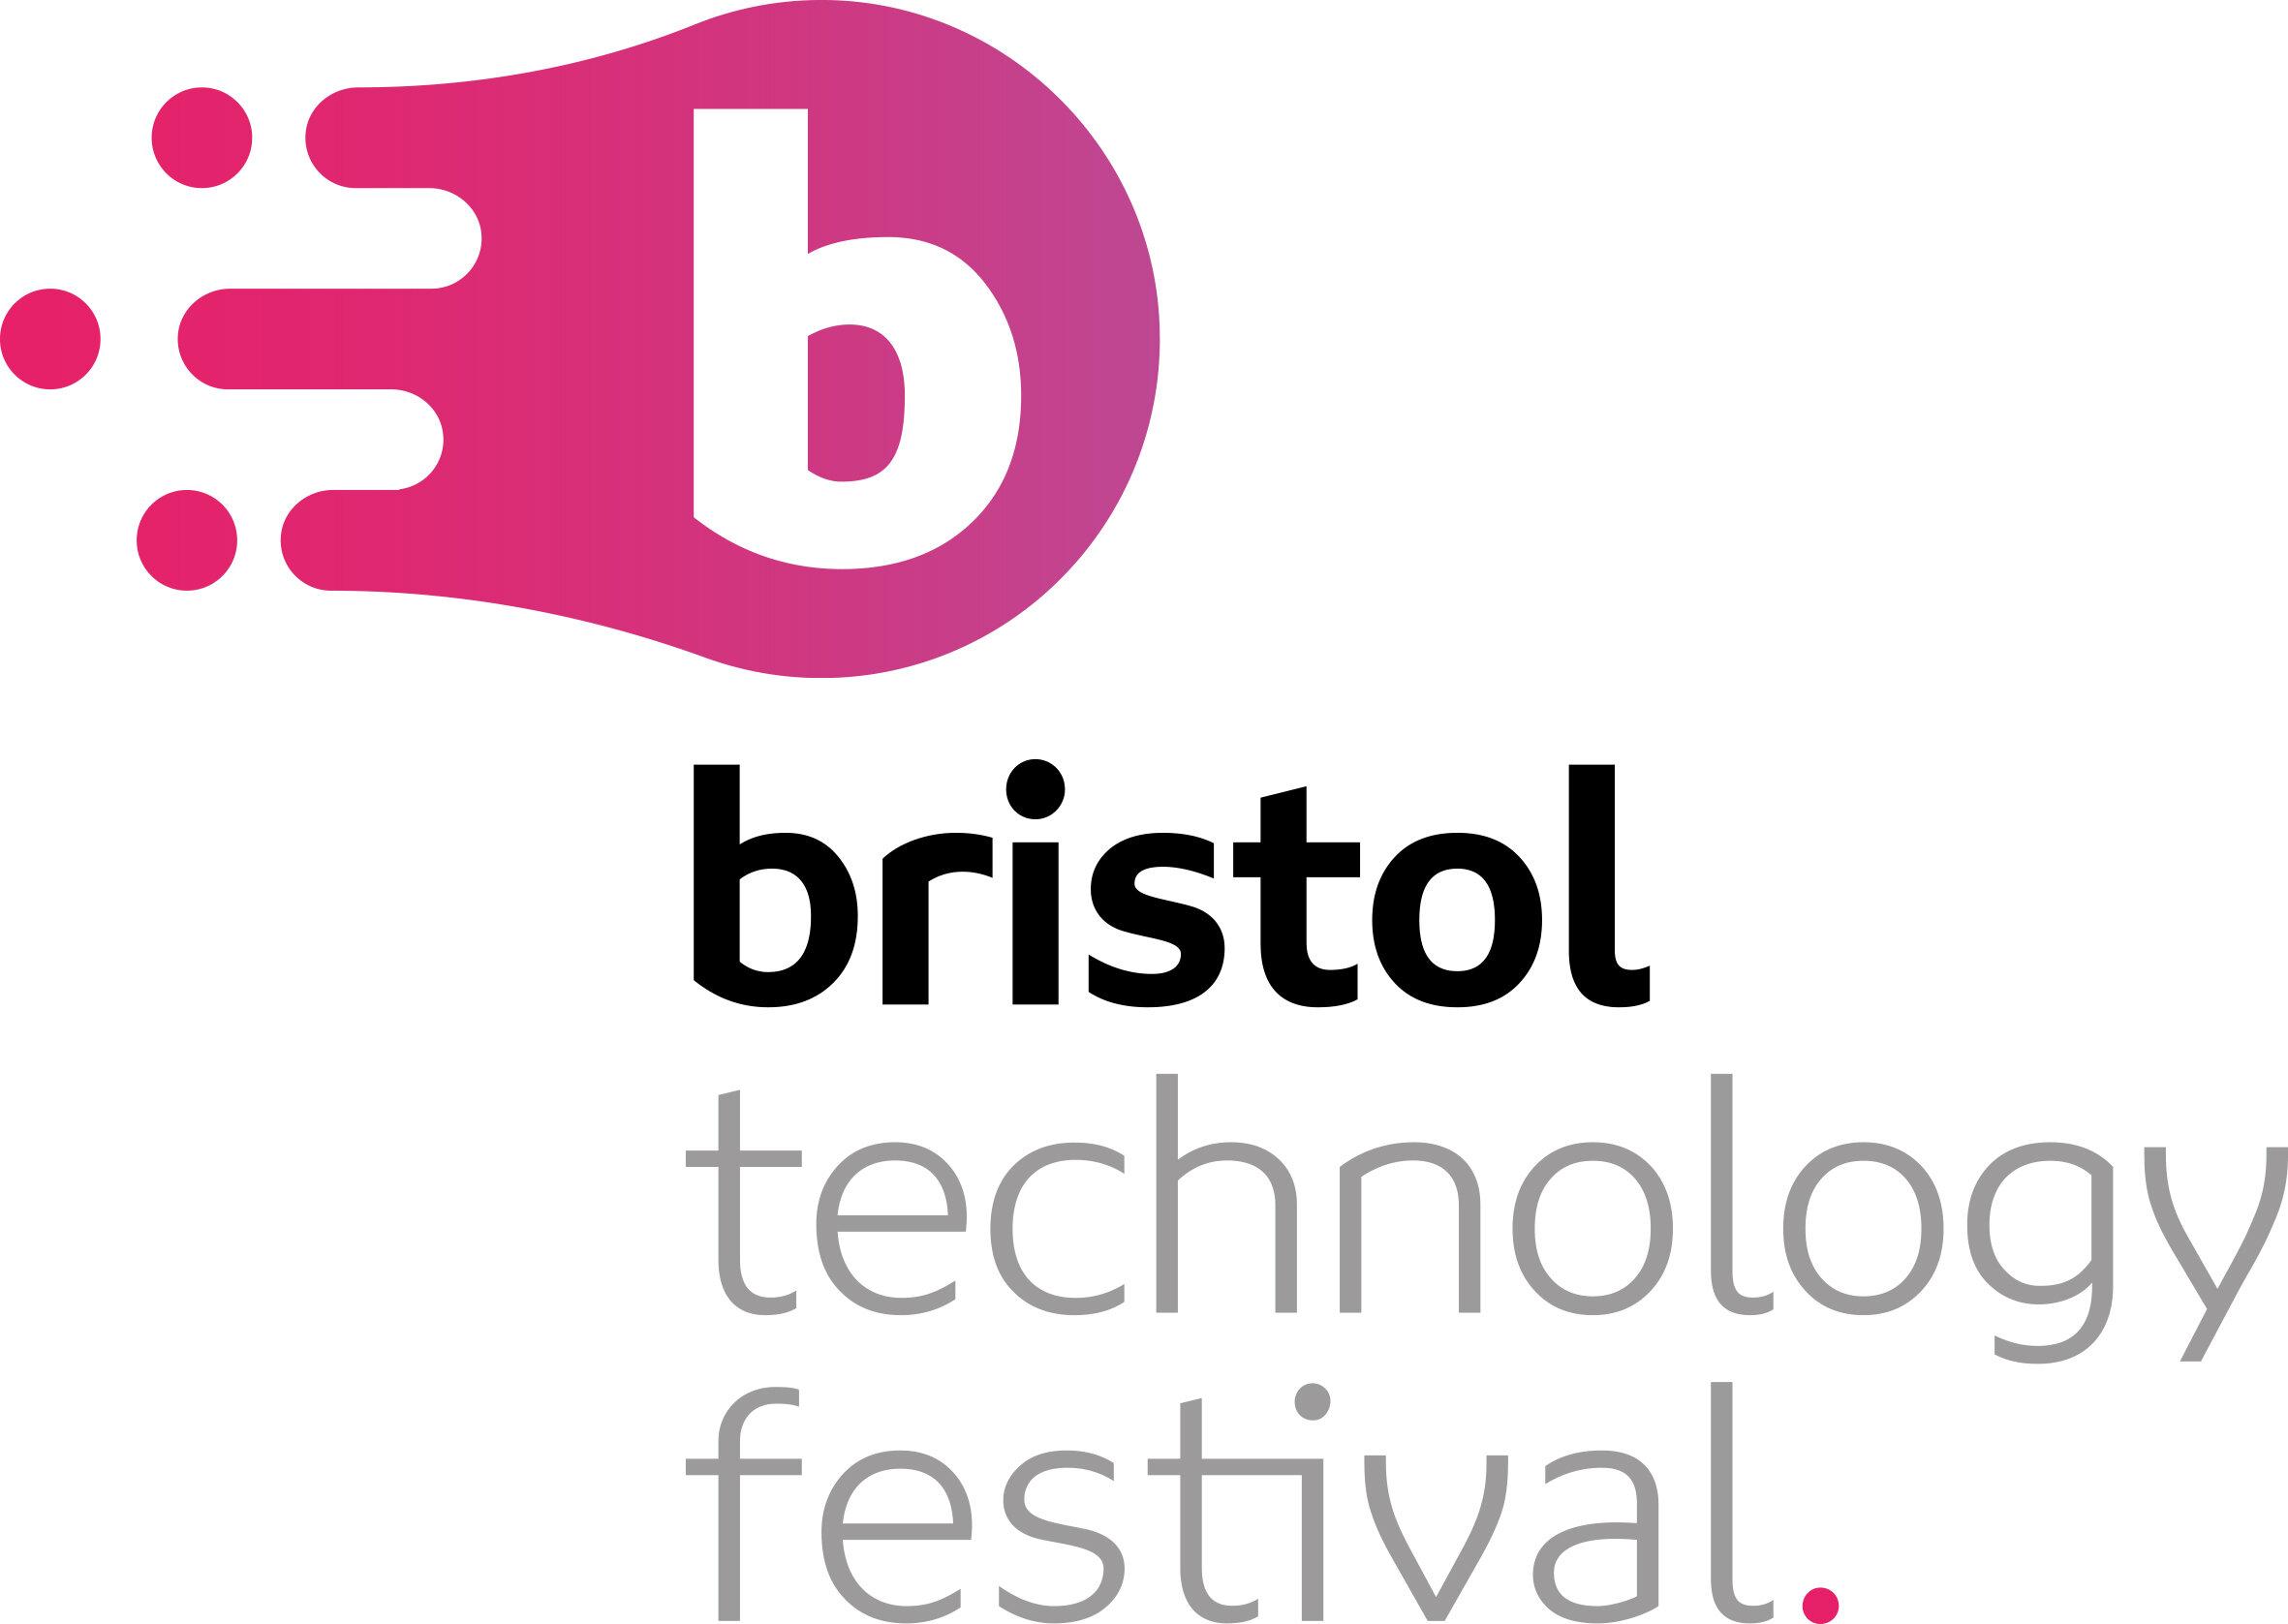 Bristol-Technology-Festival-RGB.jpg